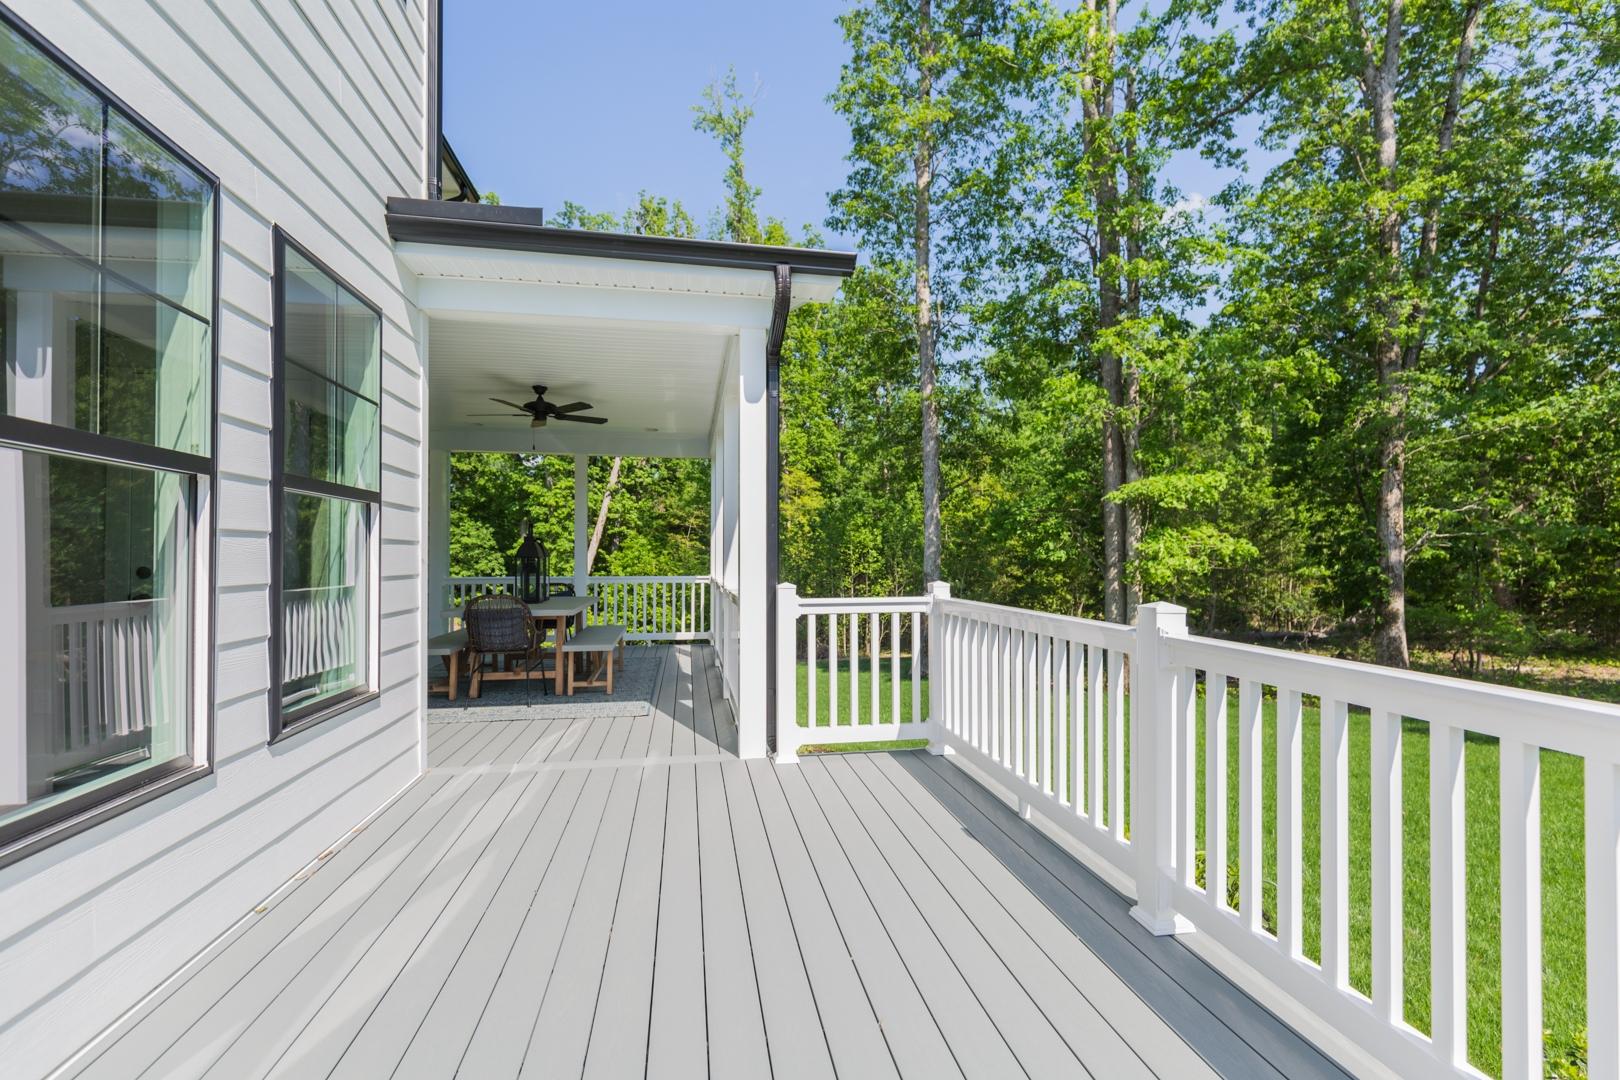 Roanoke Expanded Deck